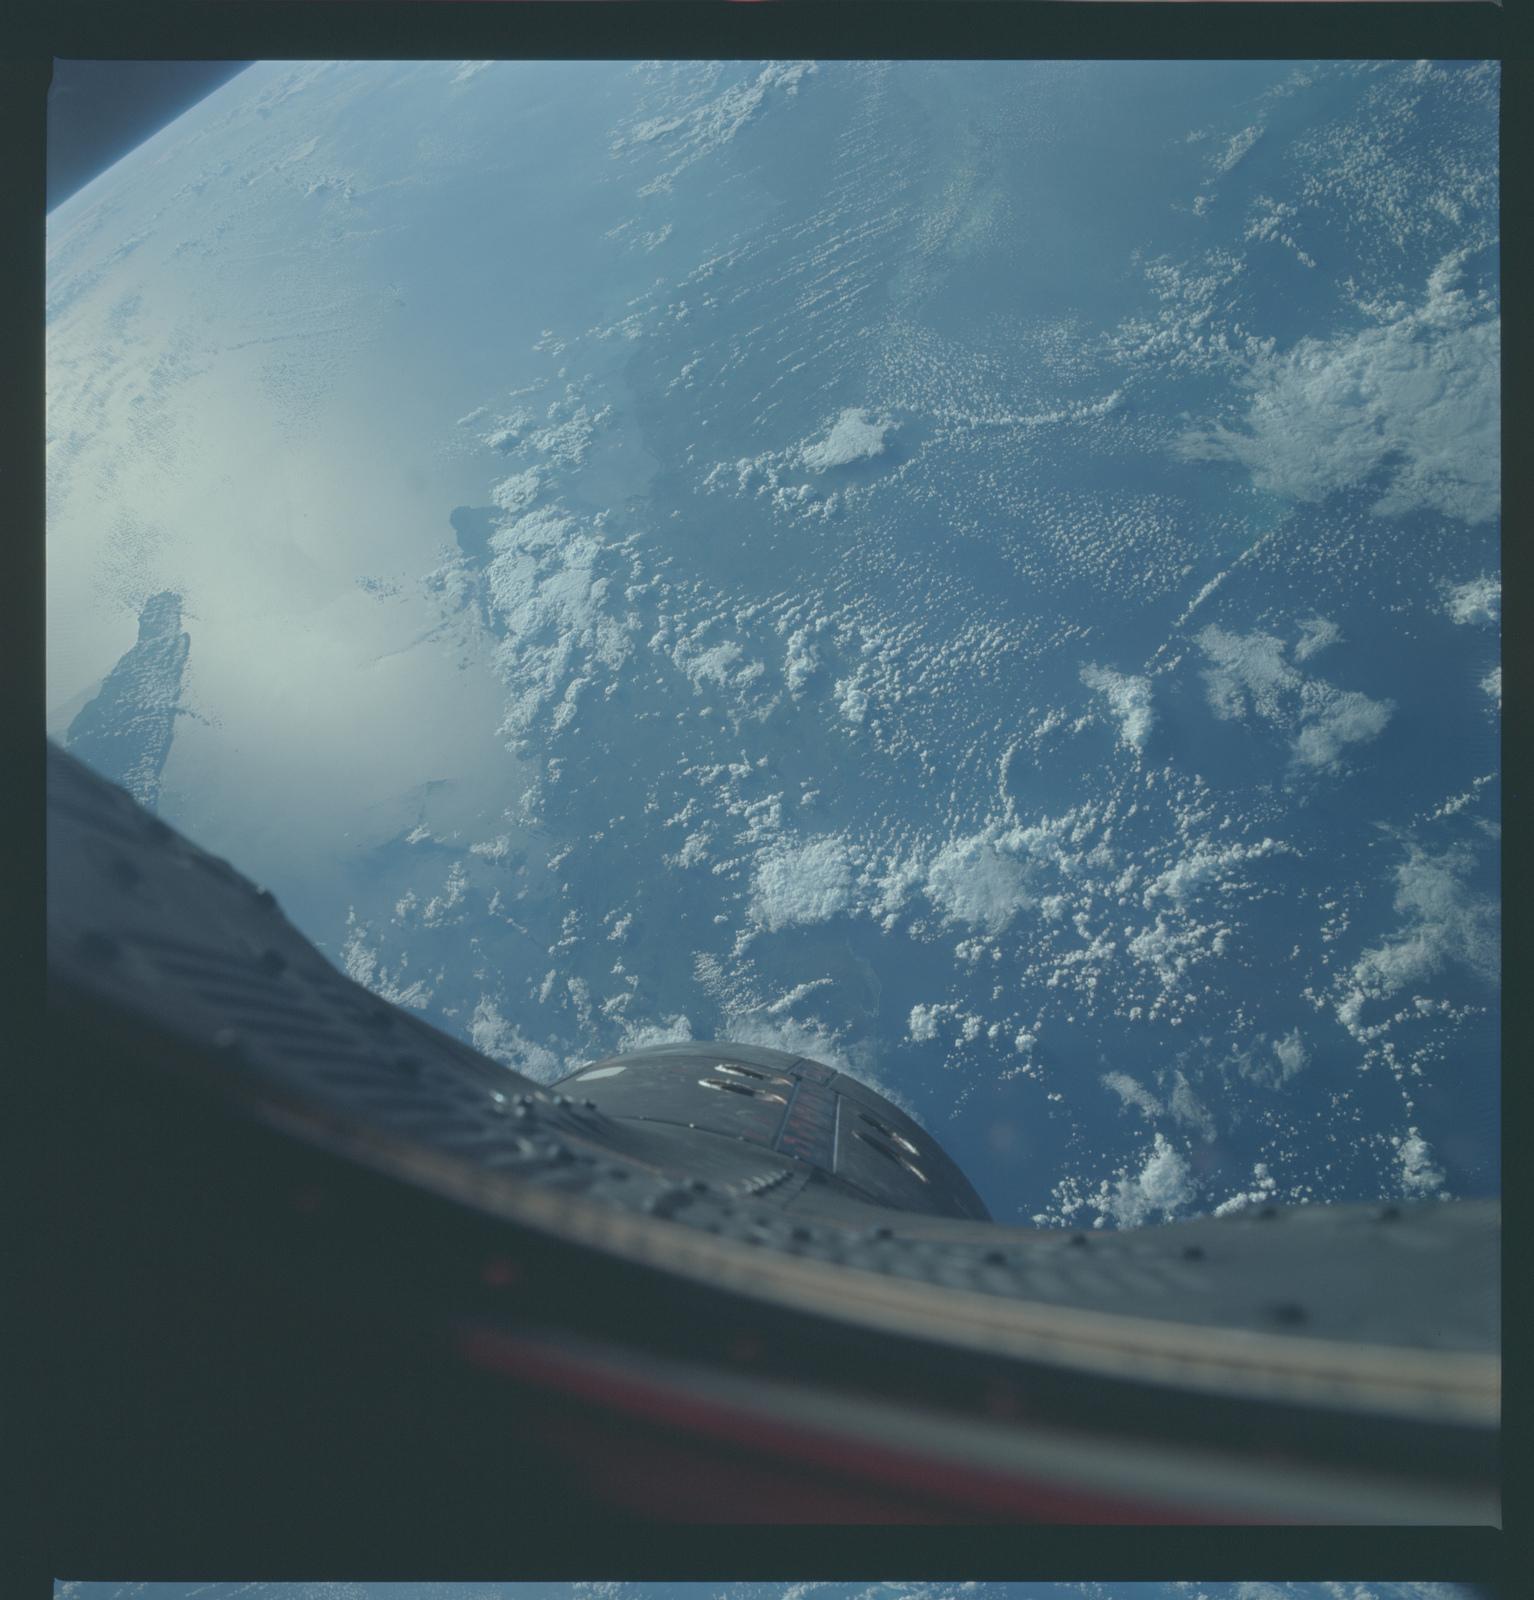 Gemini XII Mission Image - Cuba